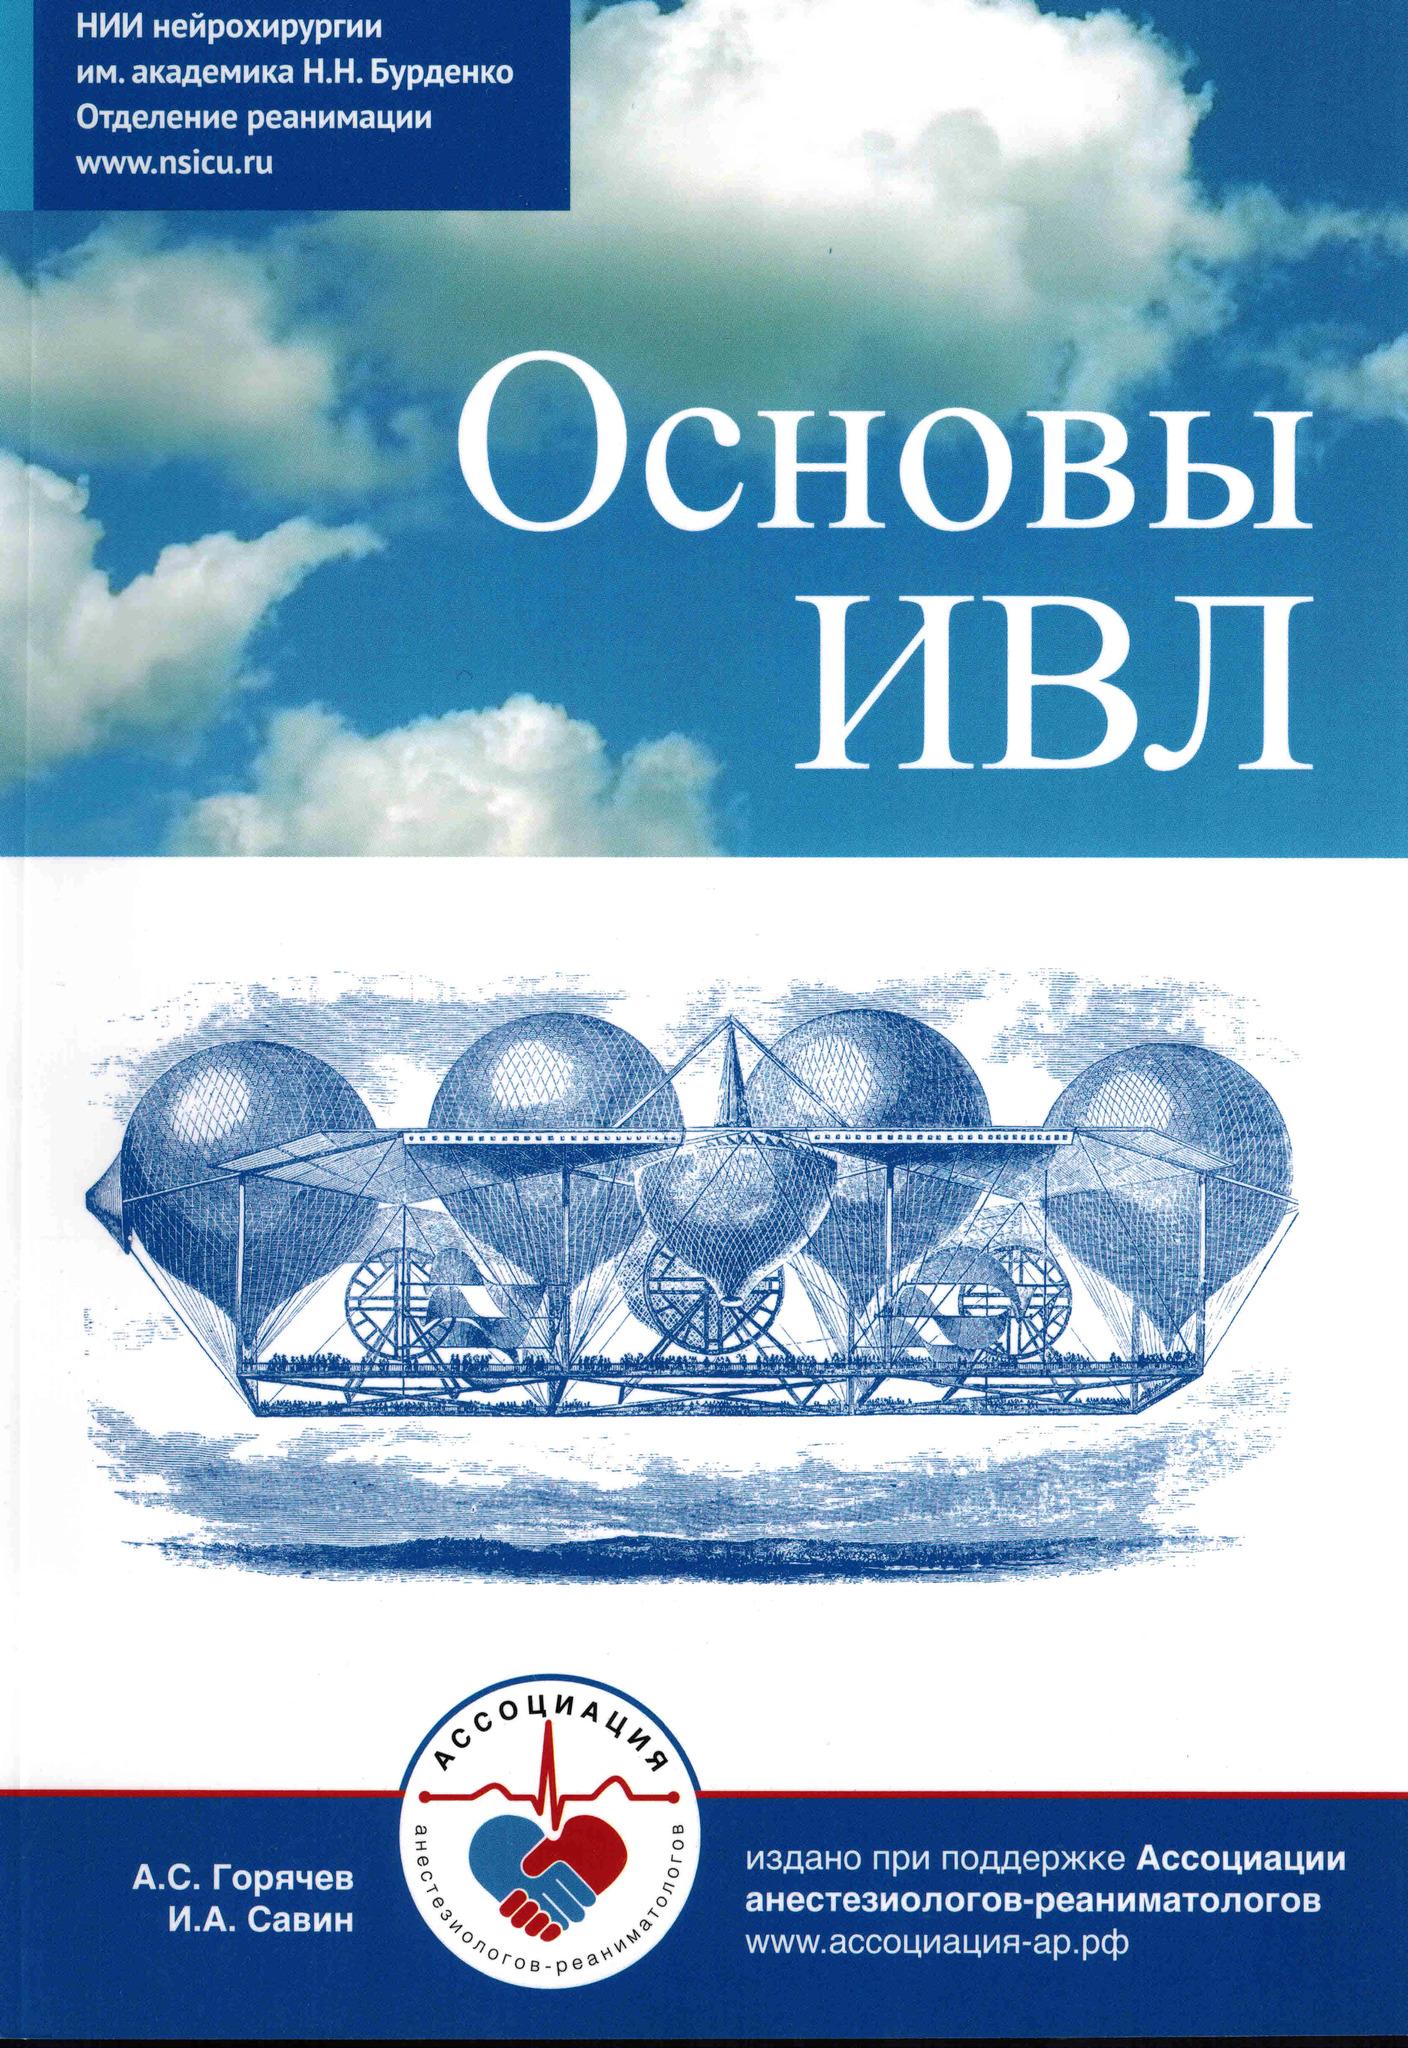 Каталог Основы ИВЛ osnoviivl19.jpg